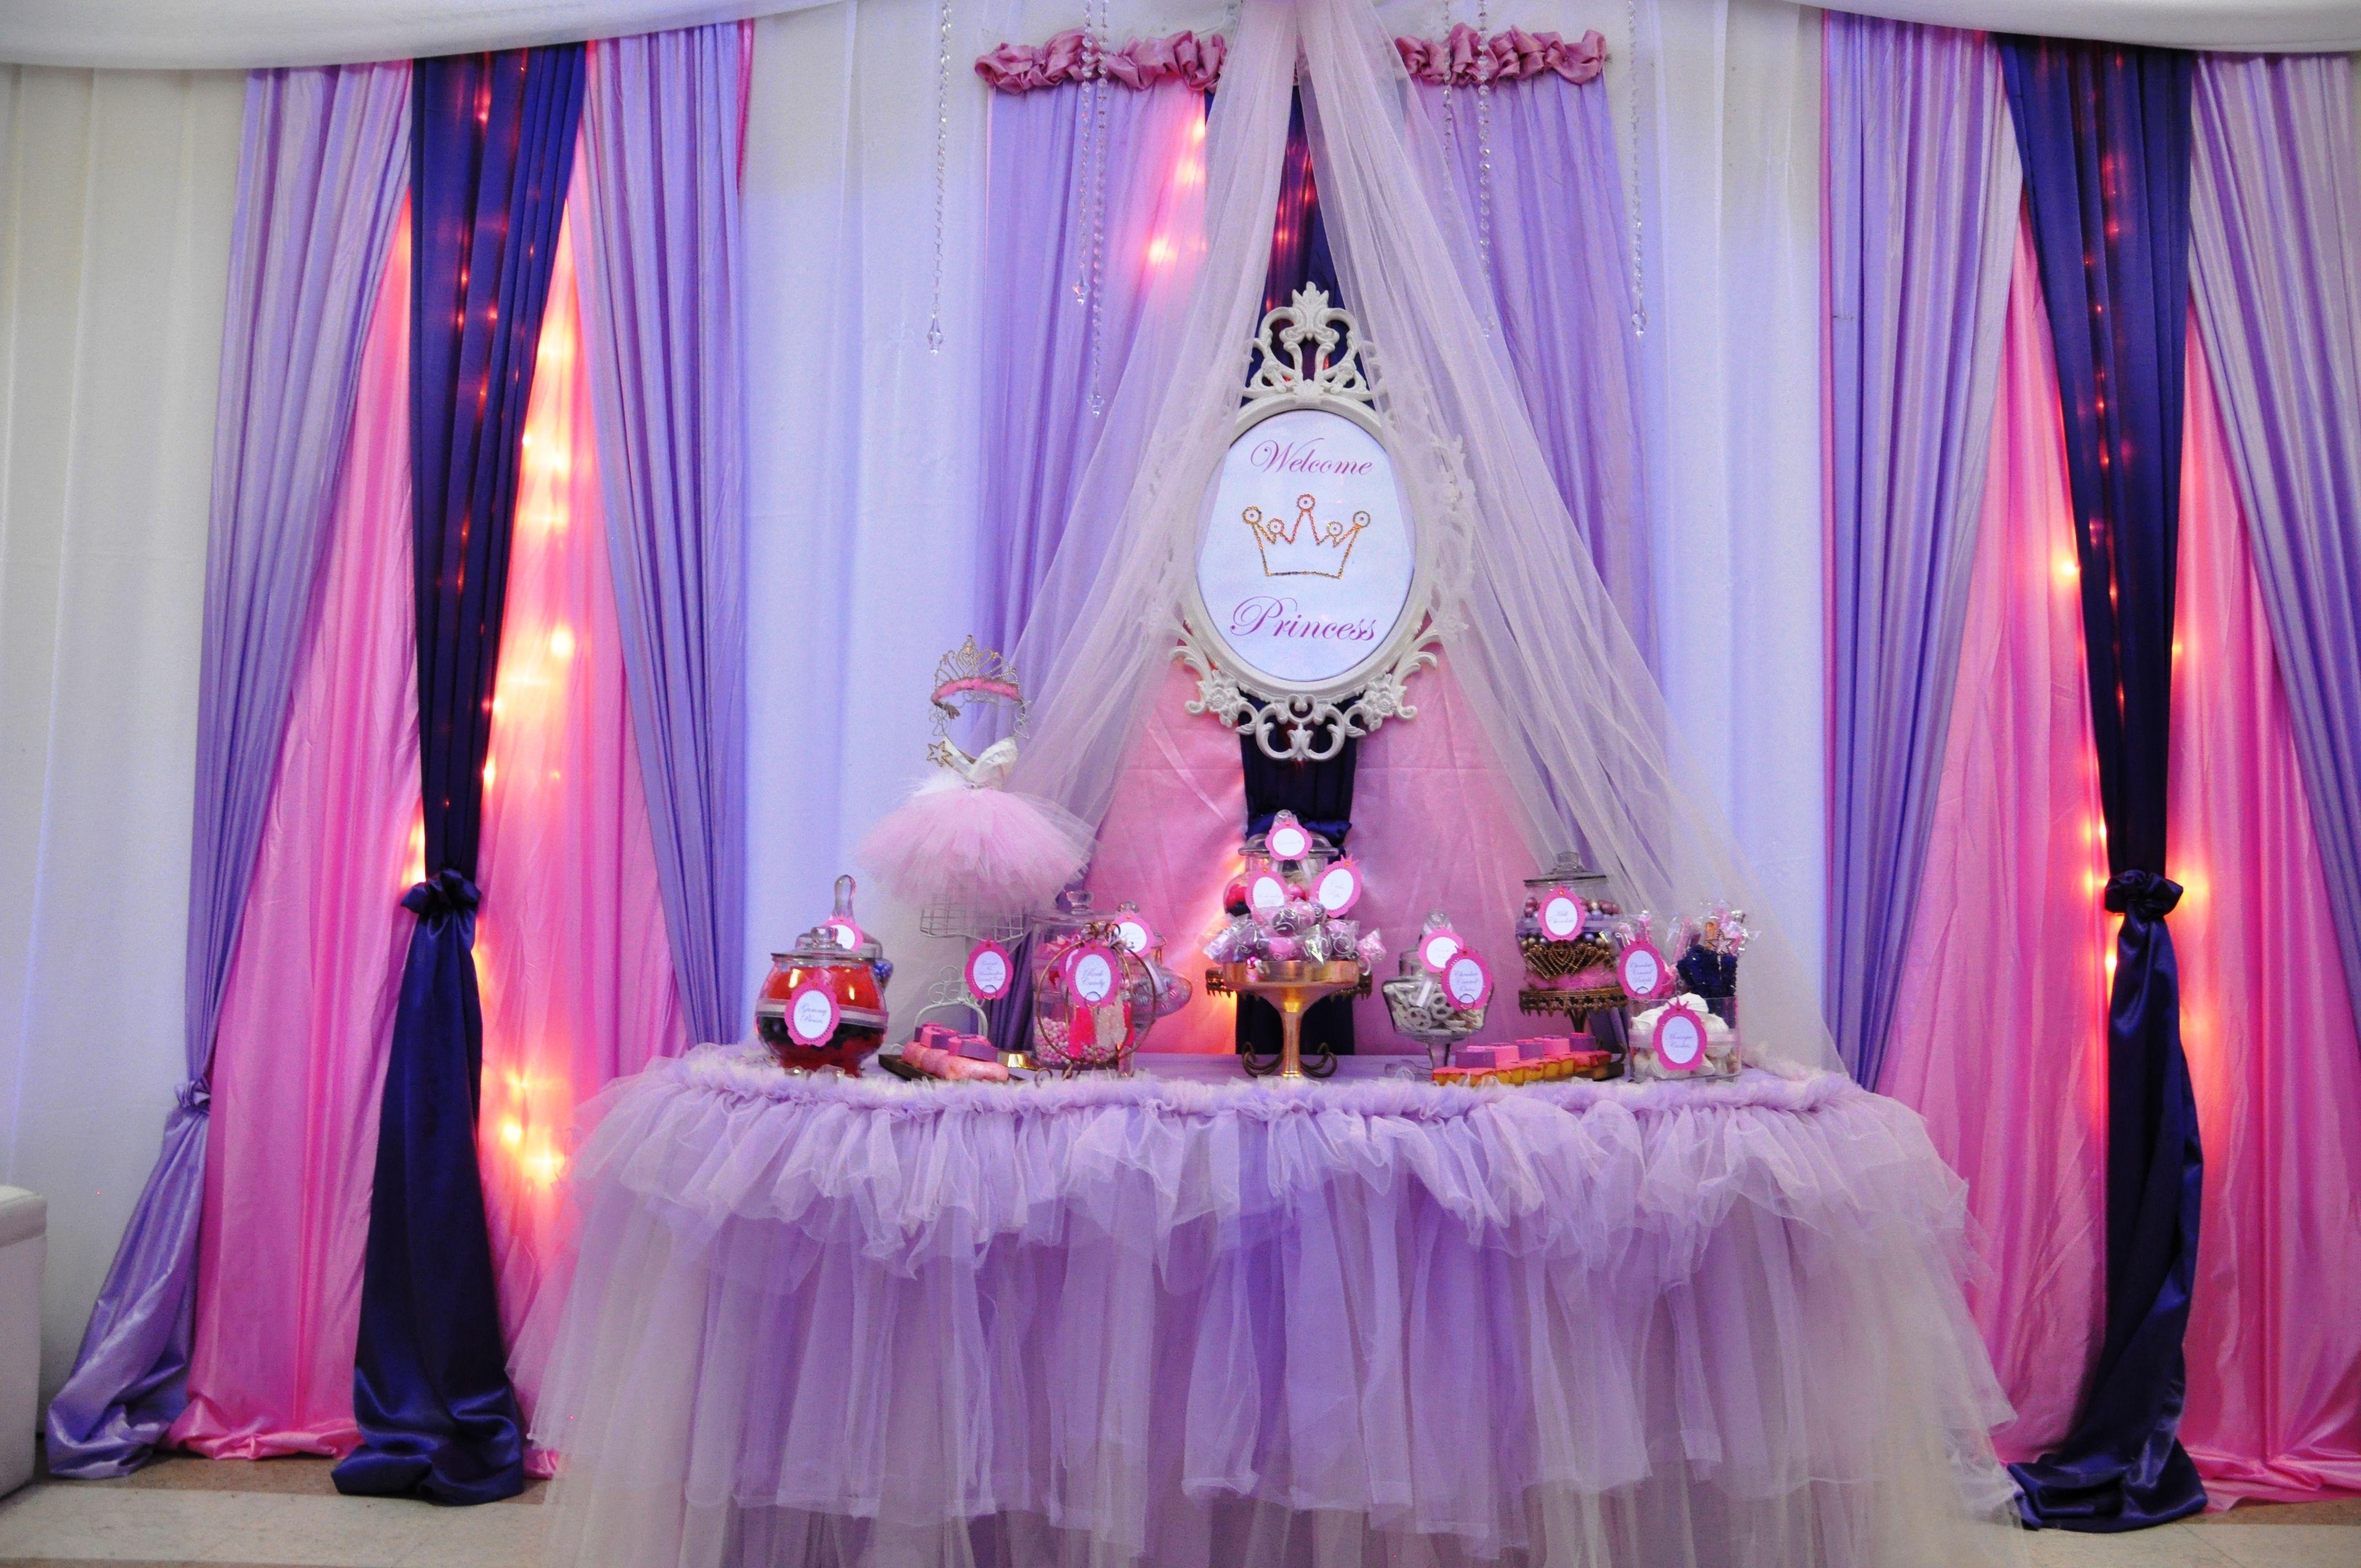 Princess Baby Shower Theme Ideas Hottest Ba Shower Themes For 2016 Best Ba  Shower Favors